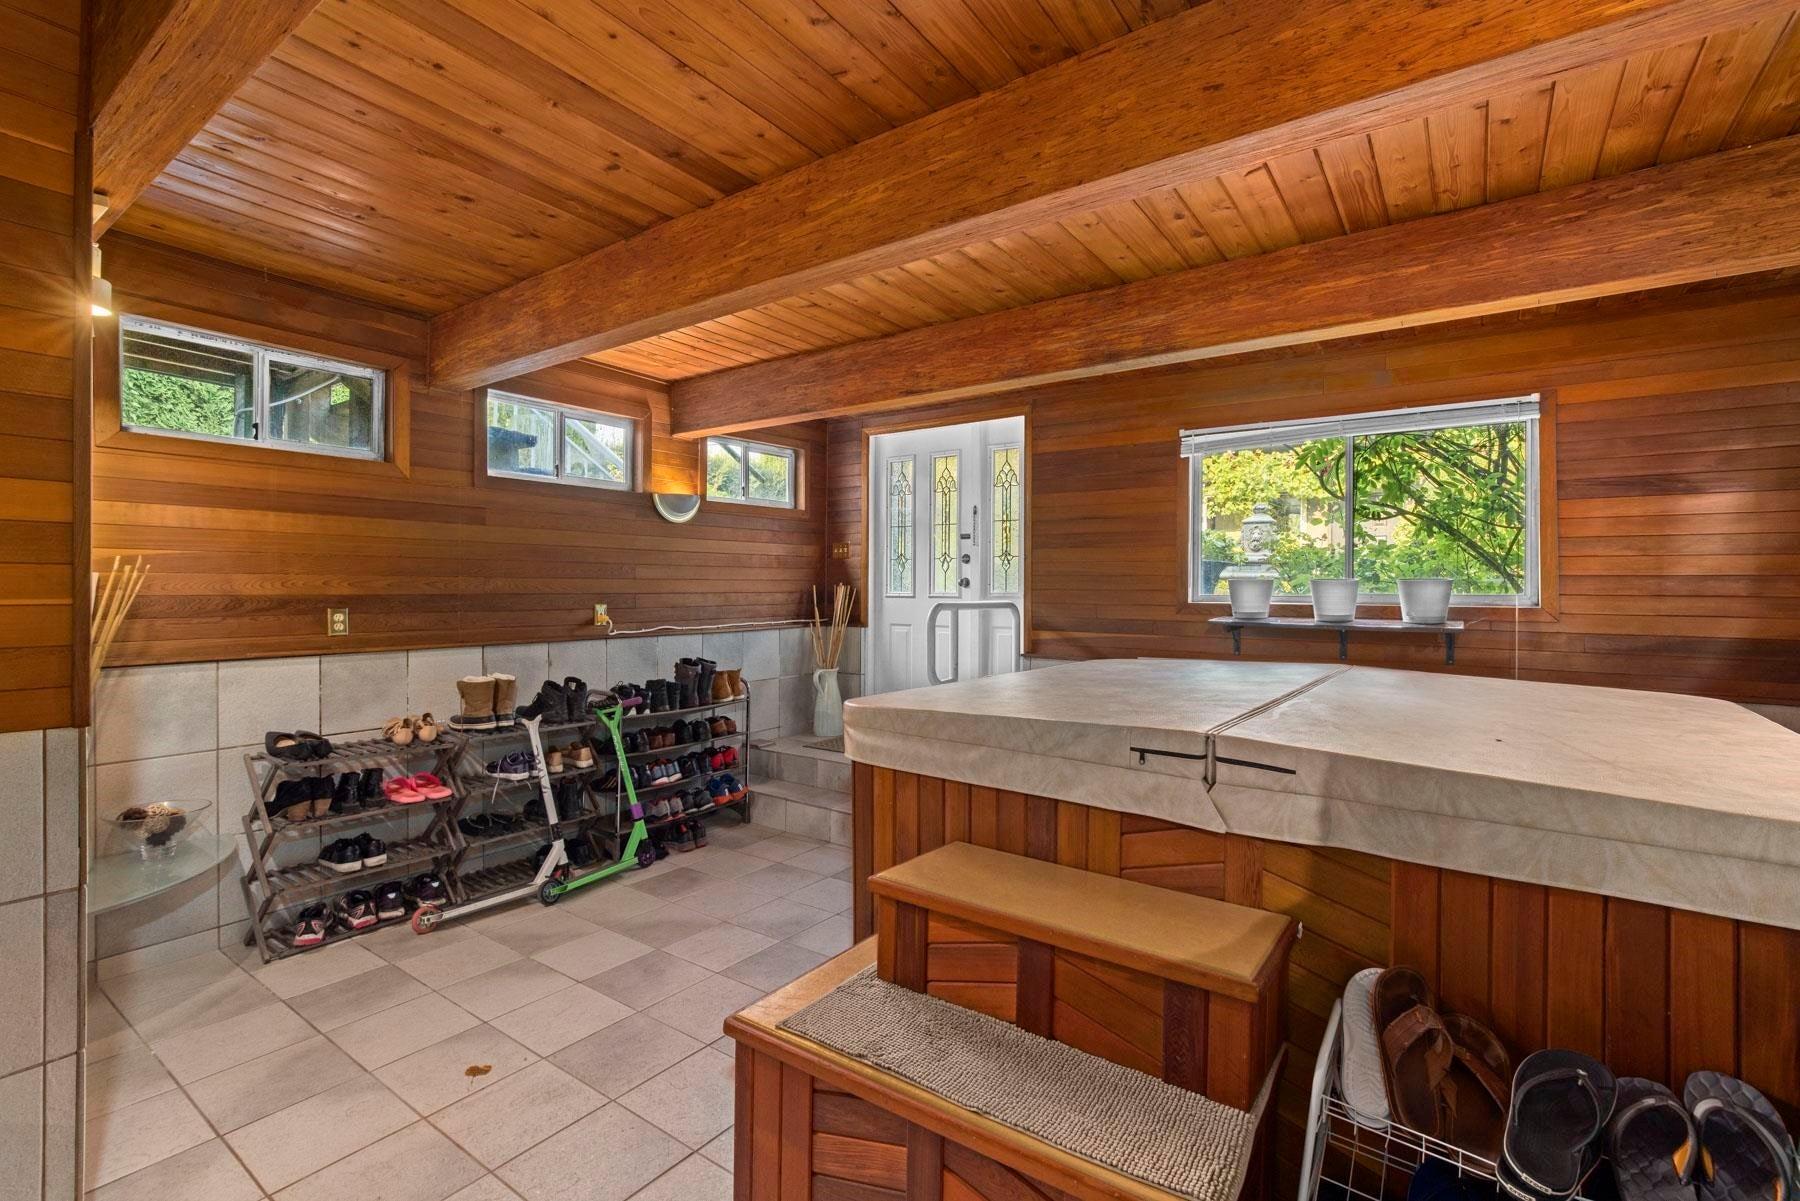 1036 GRAND BOULEVARD - Boulevard House/Single Family for sale, 5 Bedrooms (R2616987) - #22